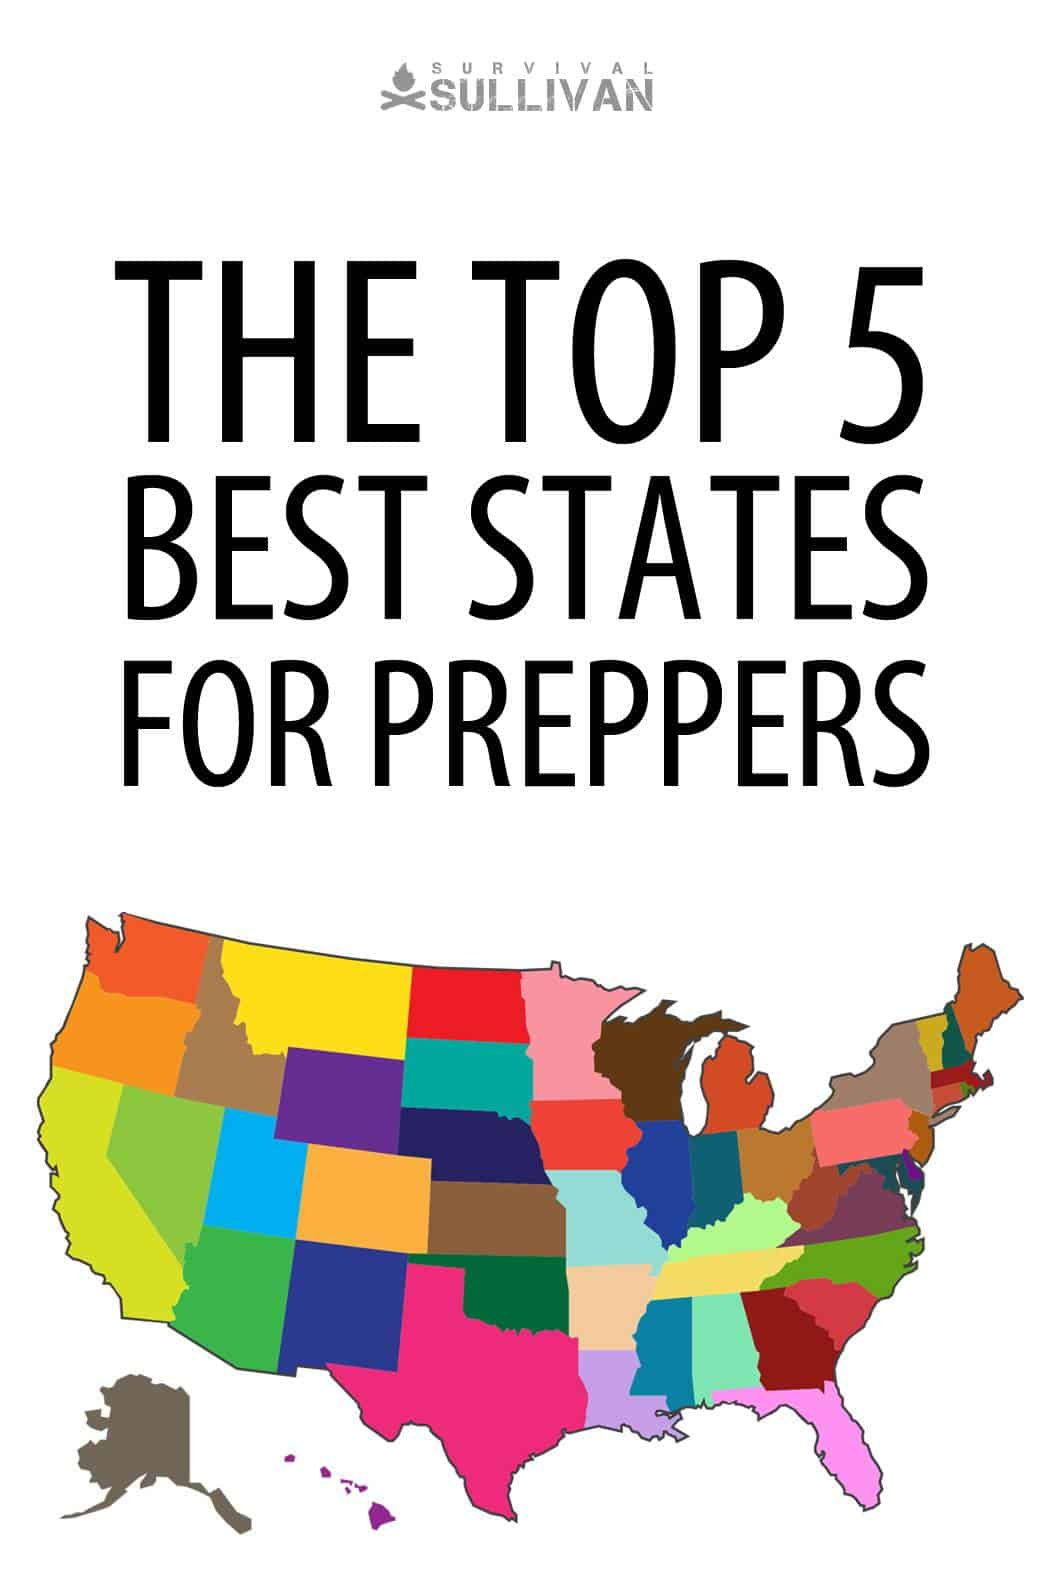 best prepper states Pinterest image